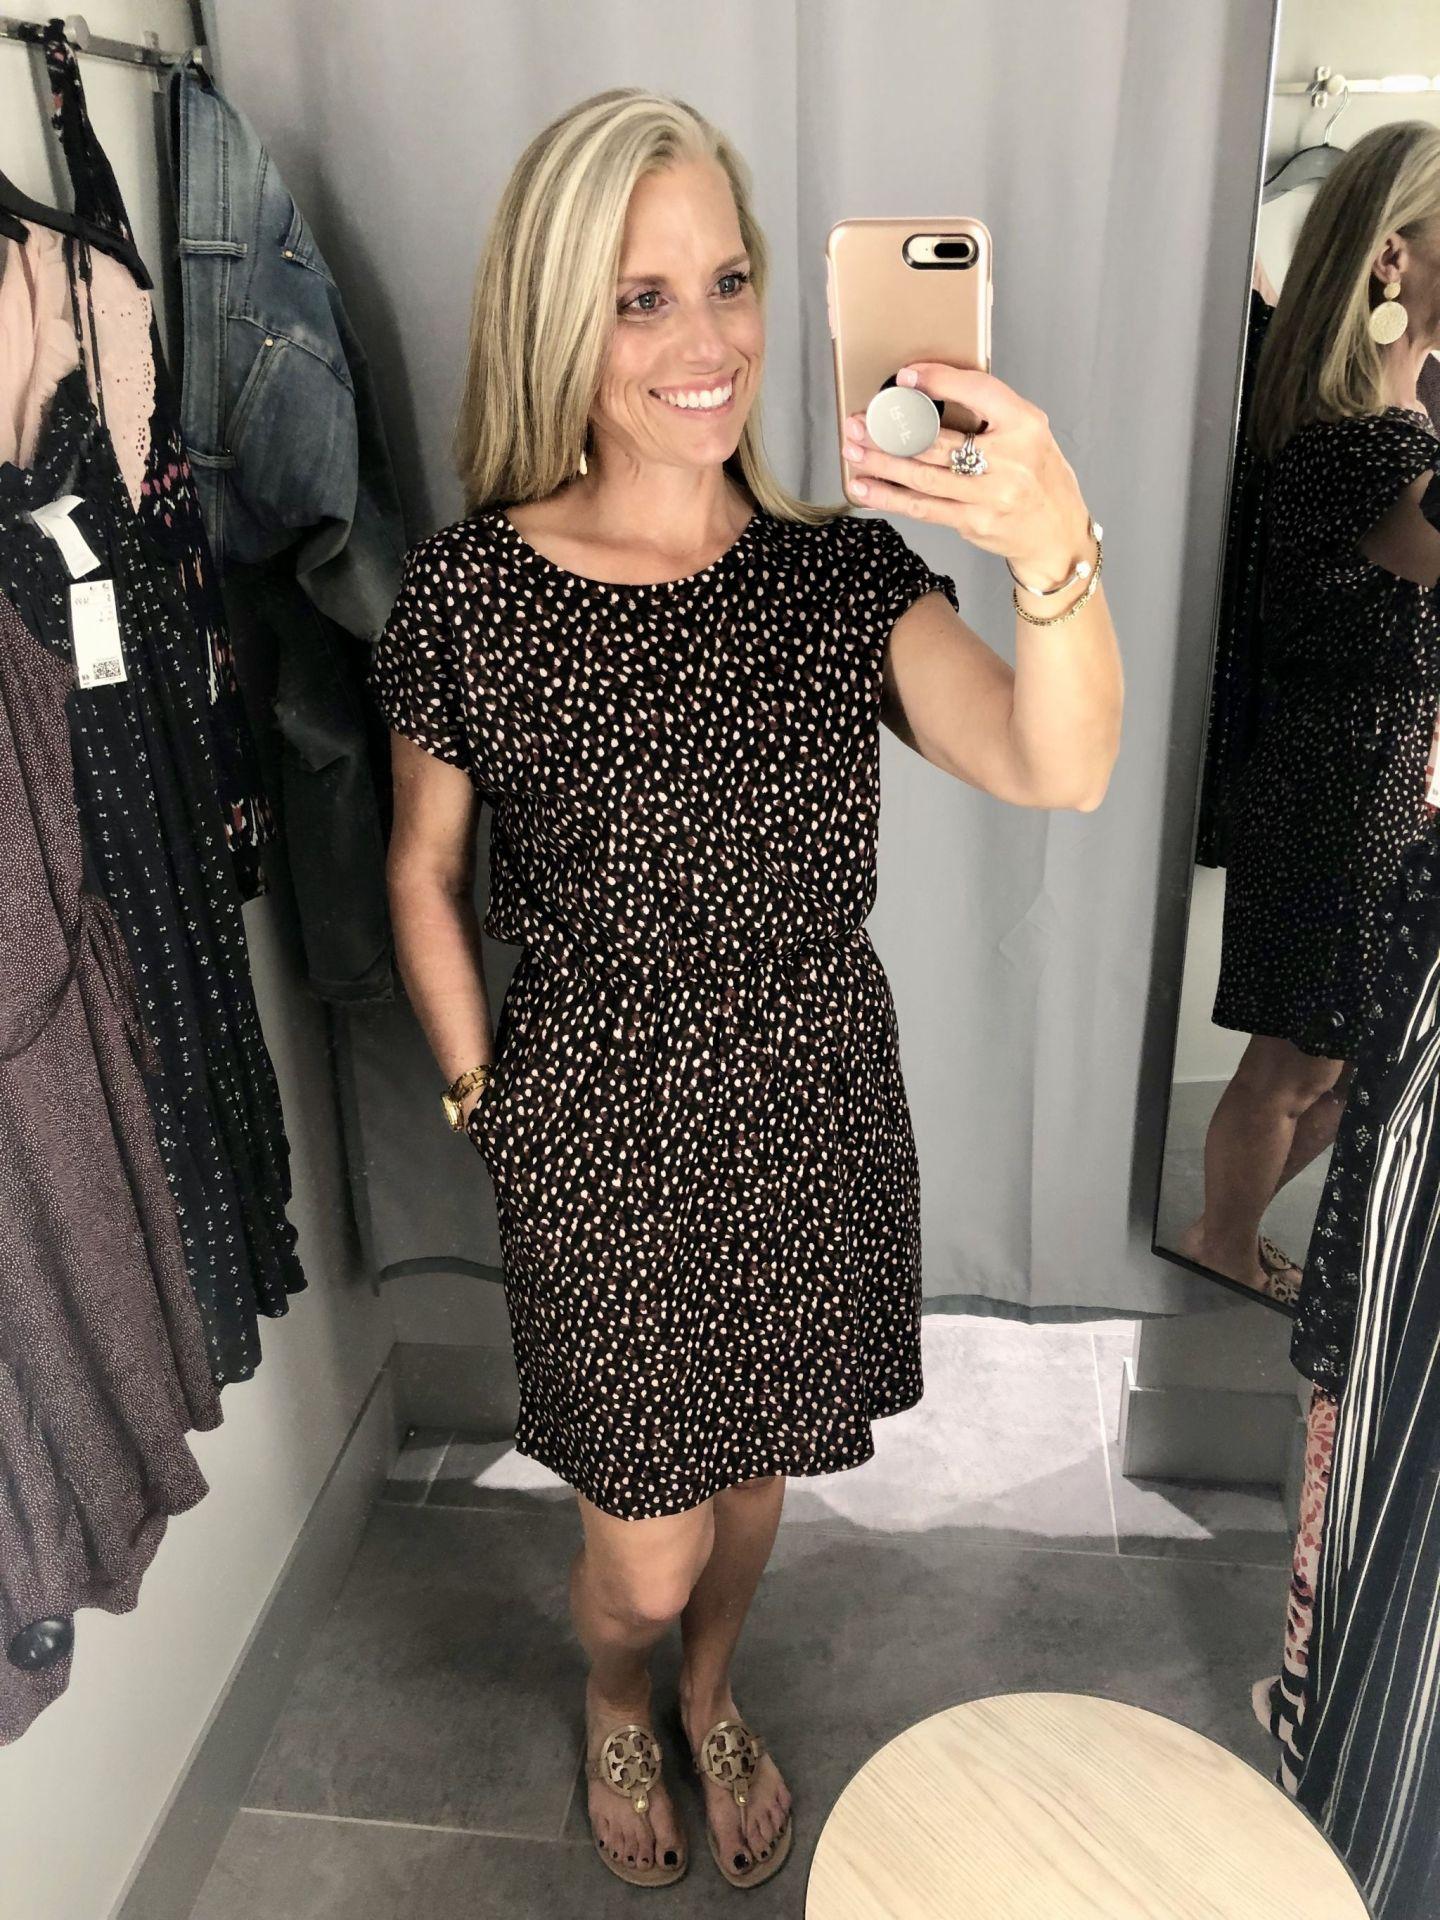 H&M Dresses, Coast to Coast